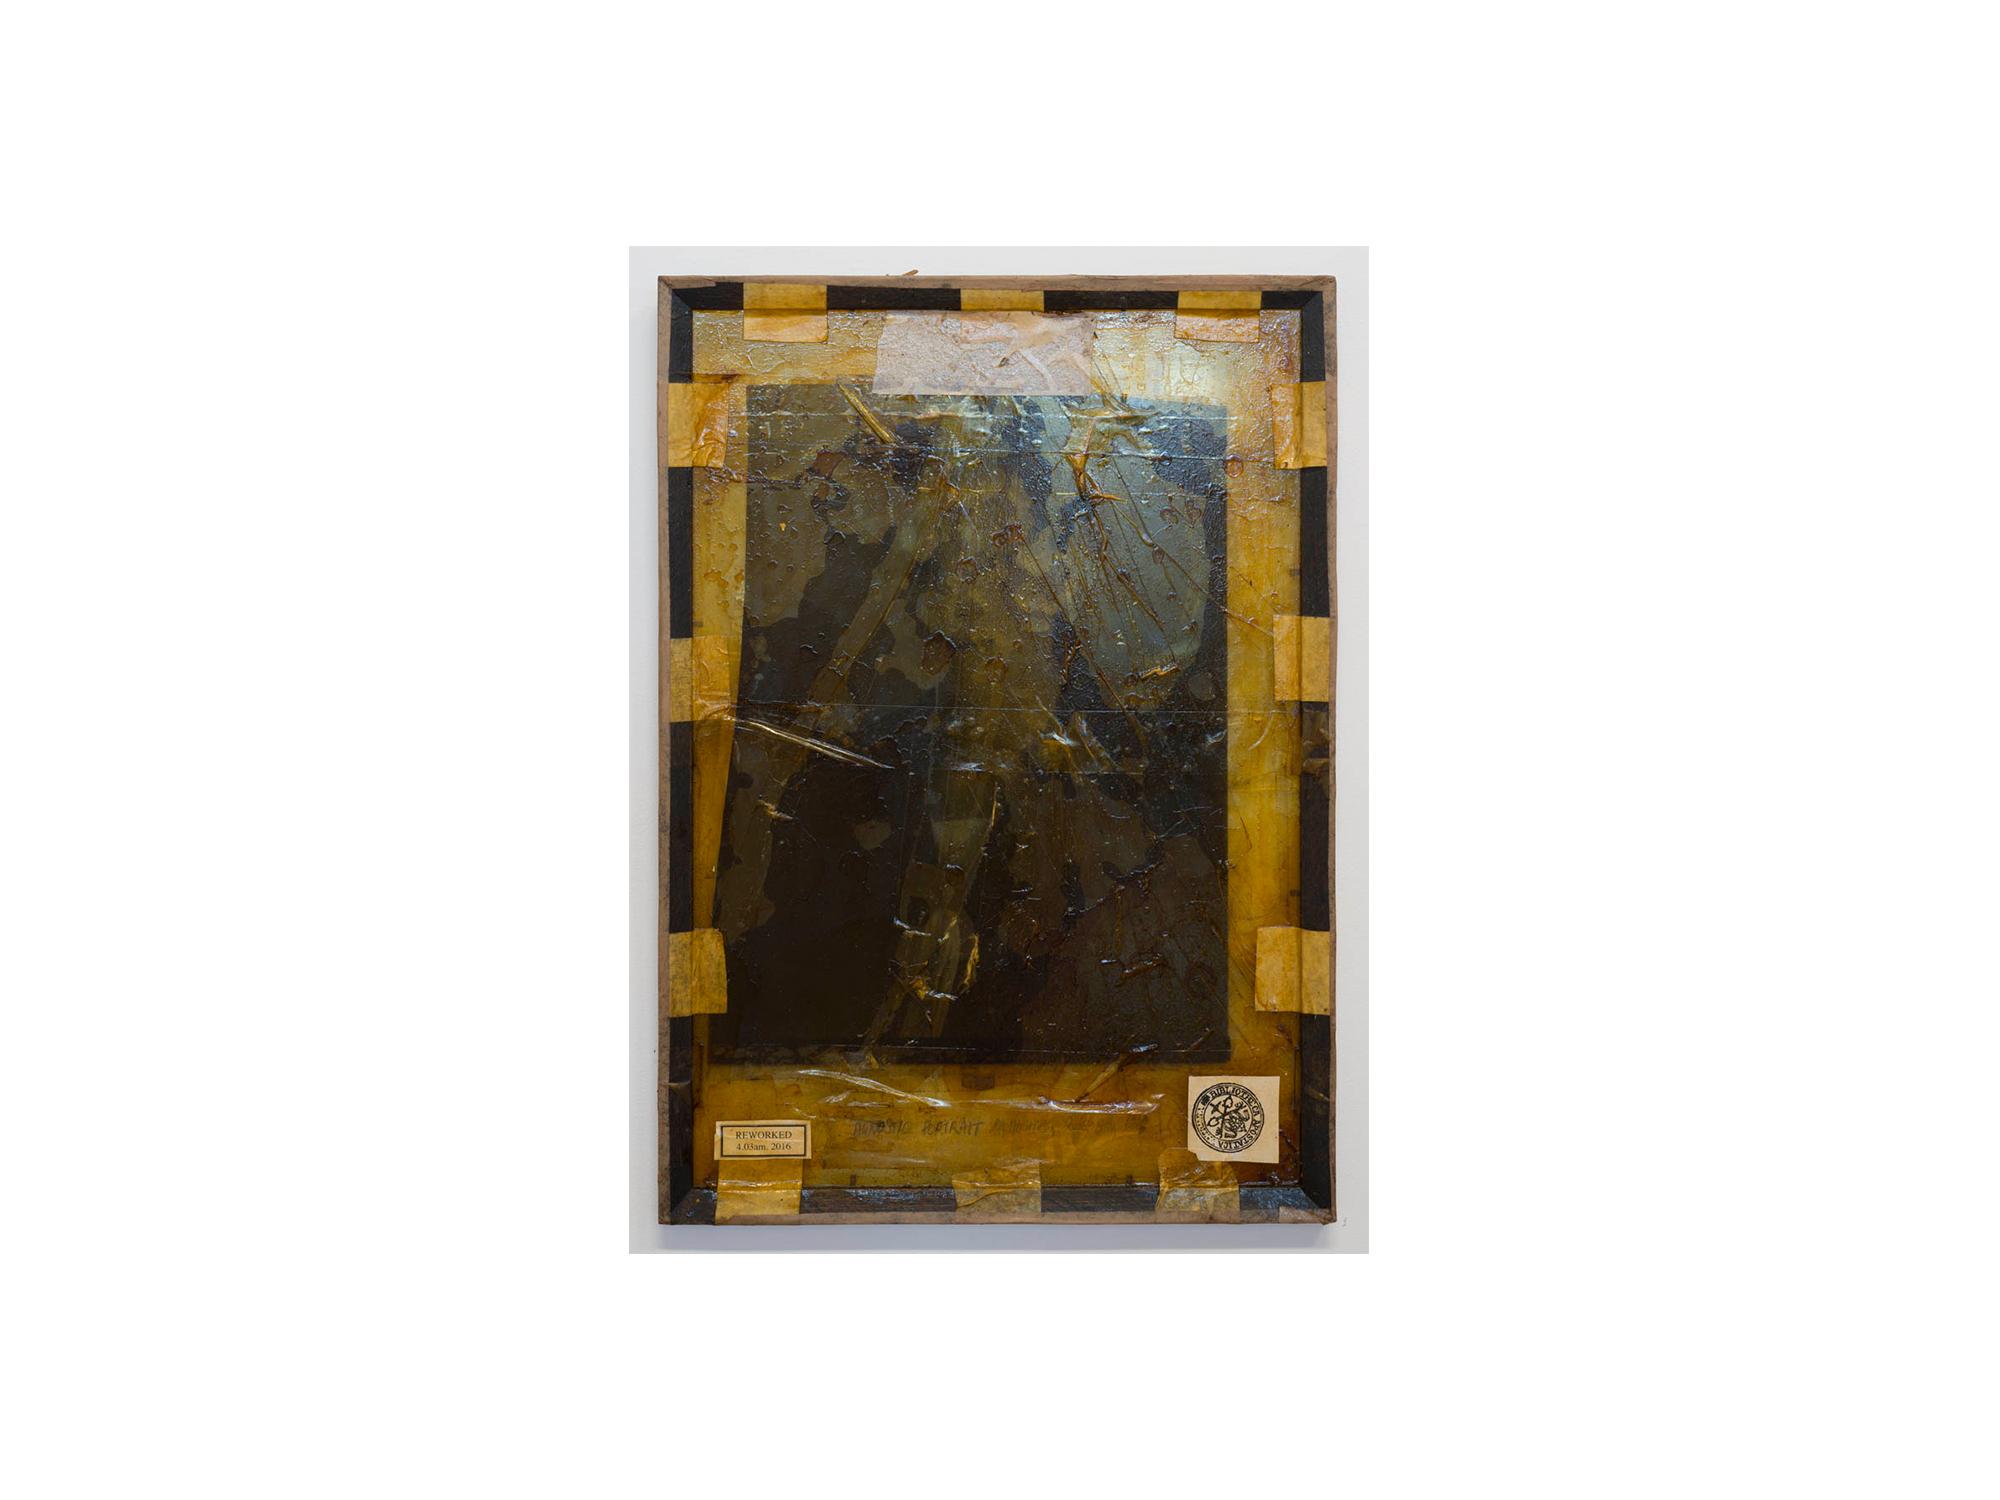 Bernhard Sachs   Agnostic Portrait , 2016 mixed media on framed glass 64 x 44cm   ARTIST BIO